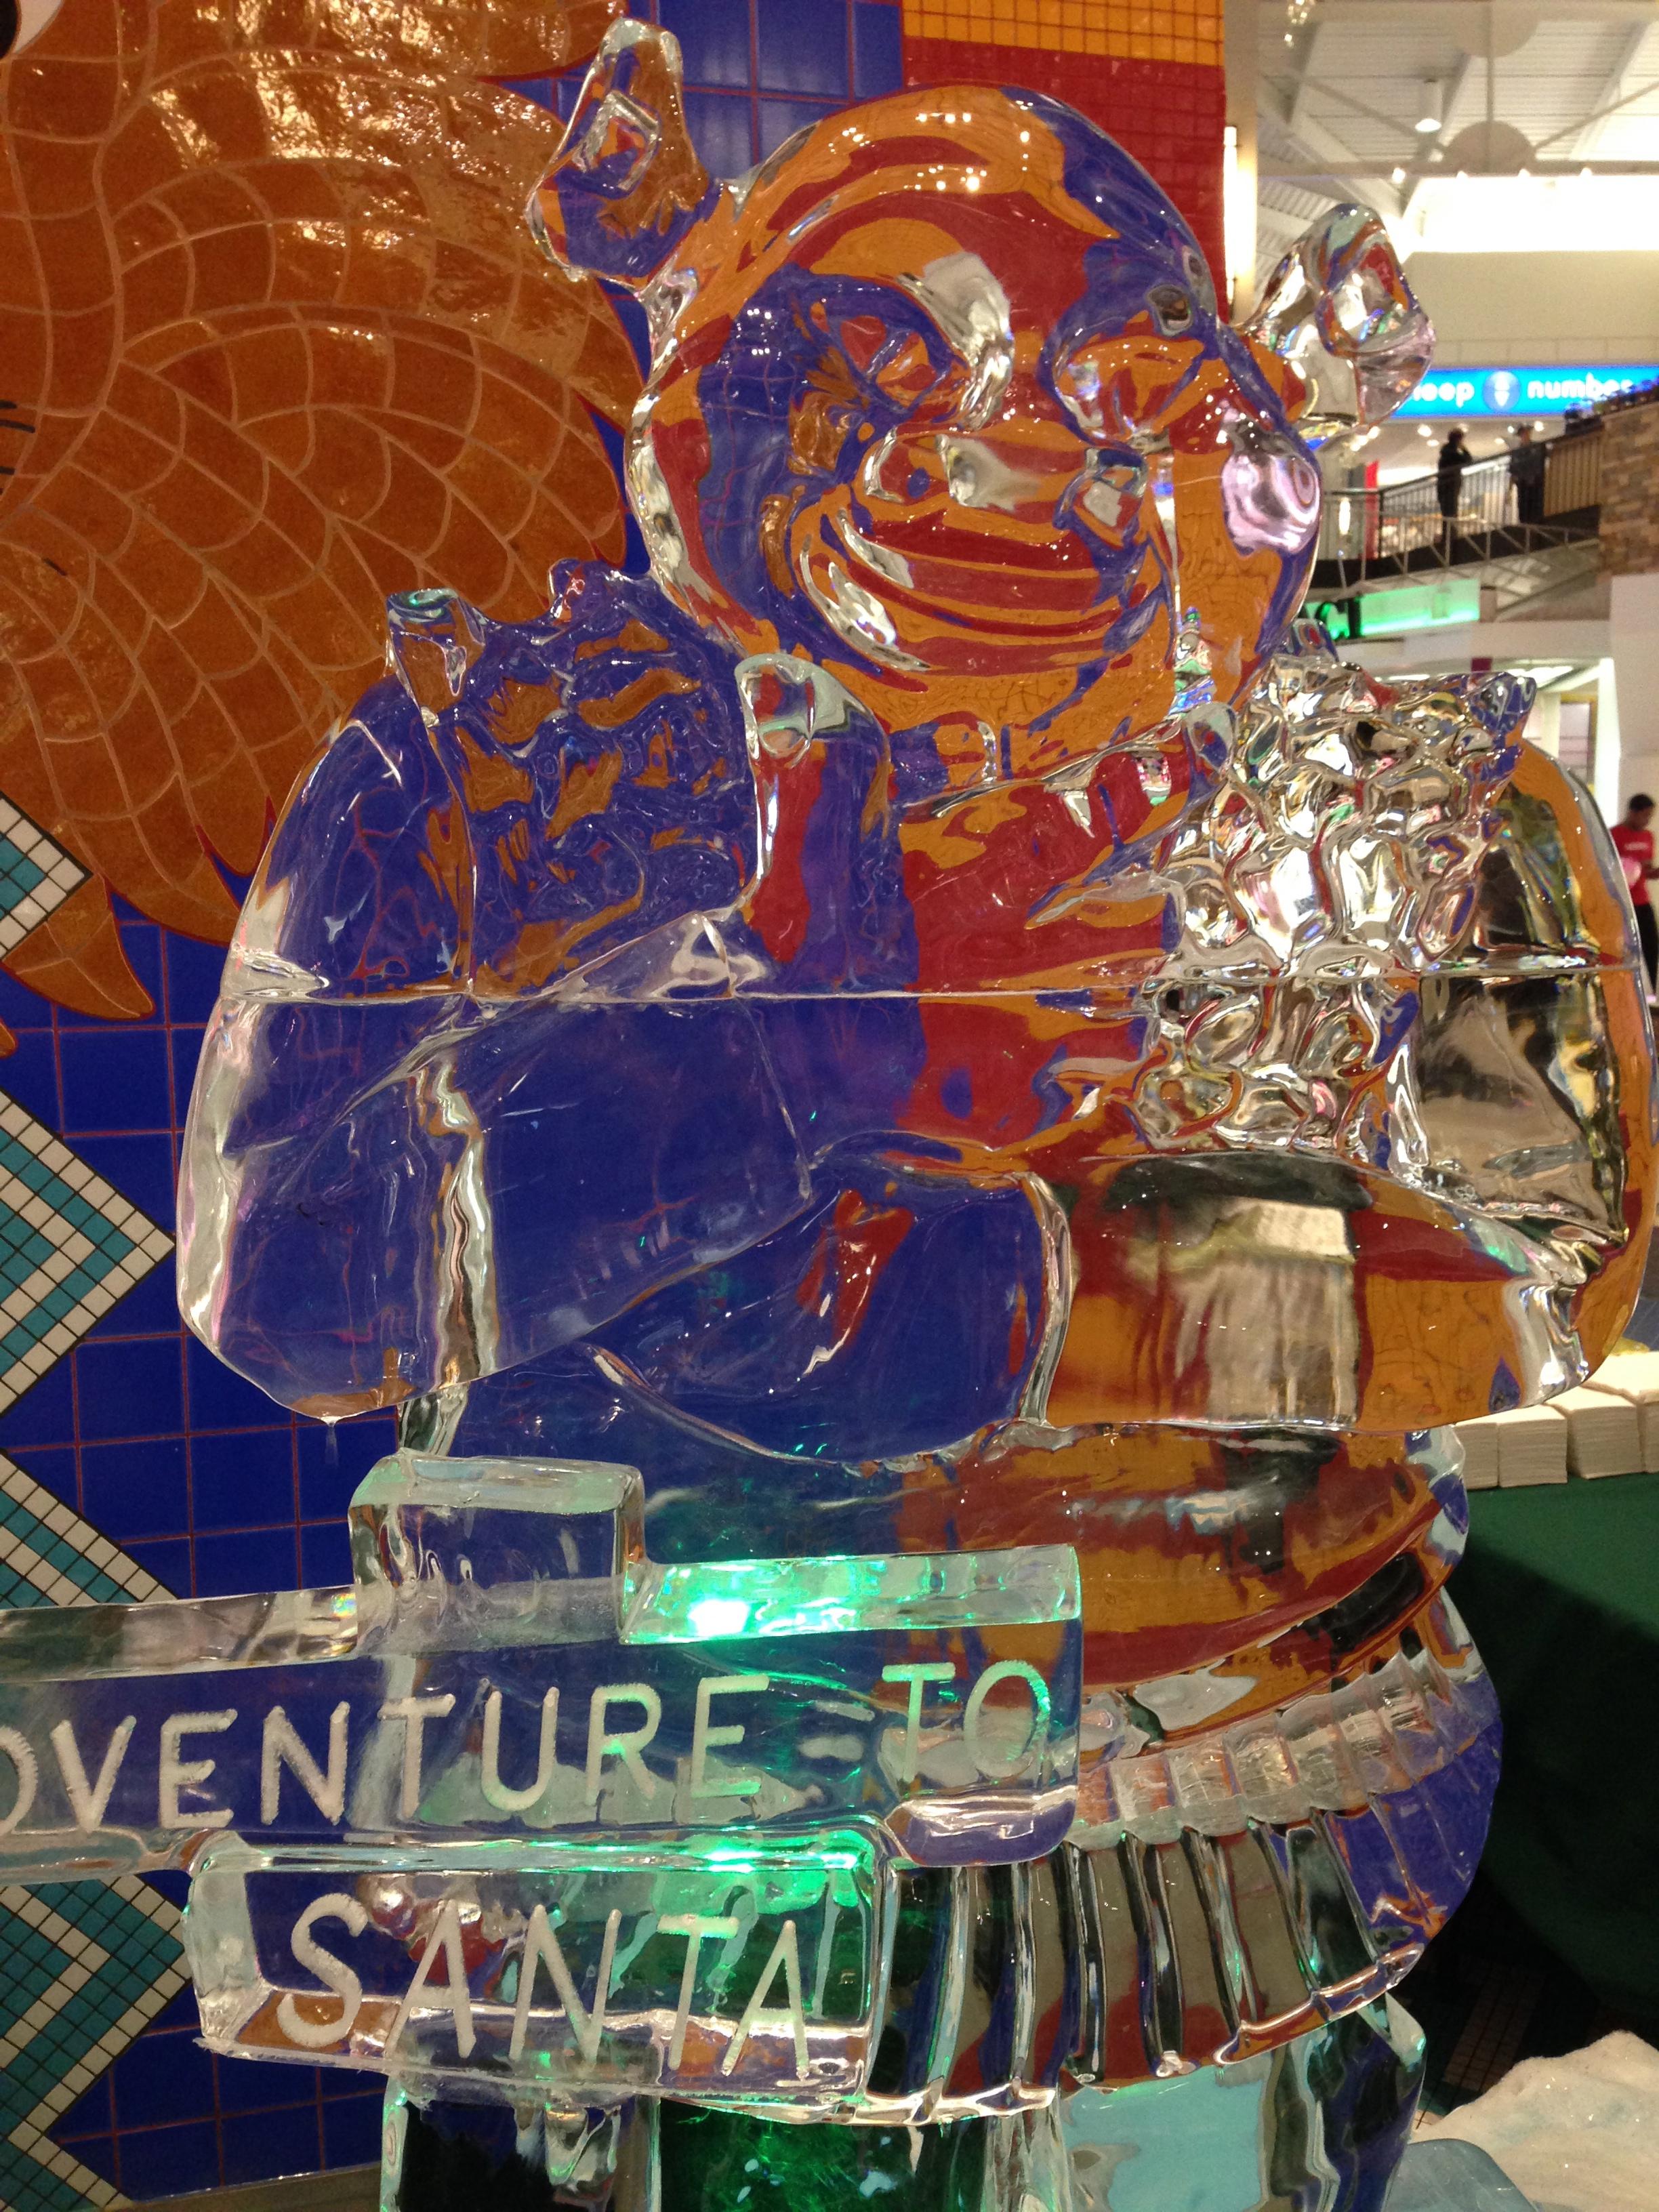 Shrek Ice sculpture